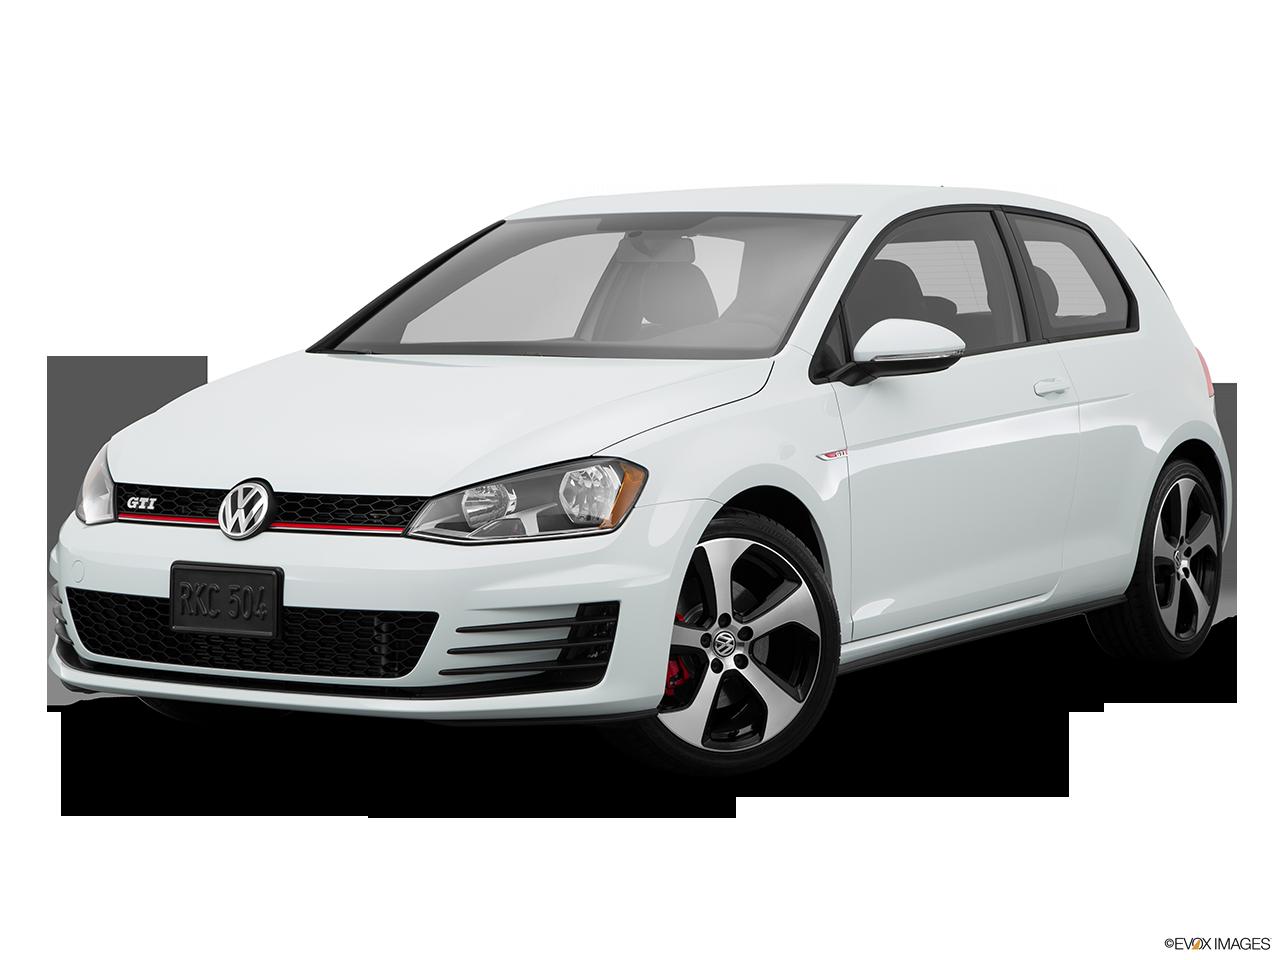 2015 Volkswagen Golf GTI serving Nashville